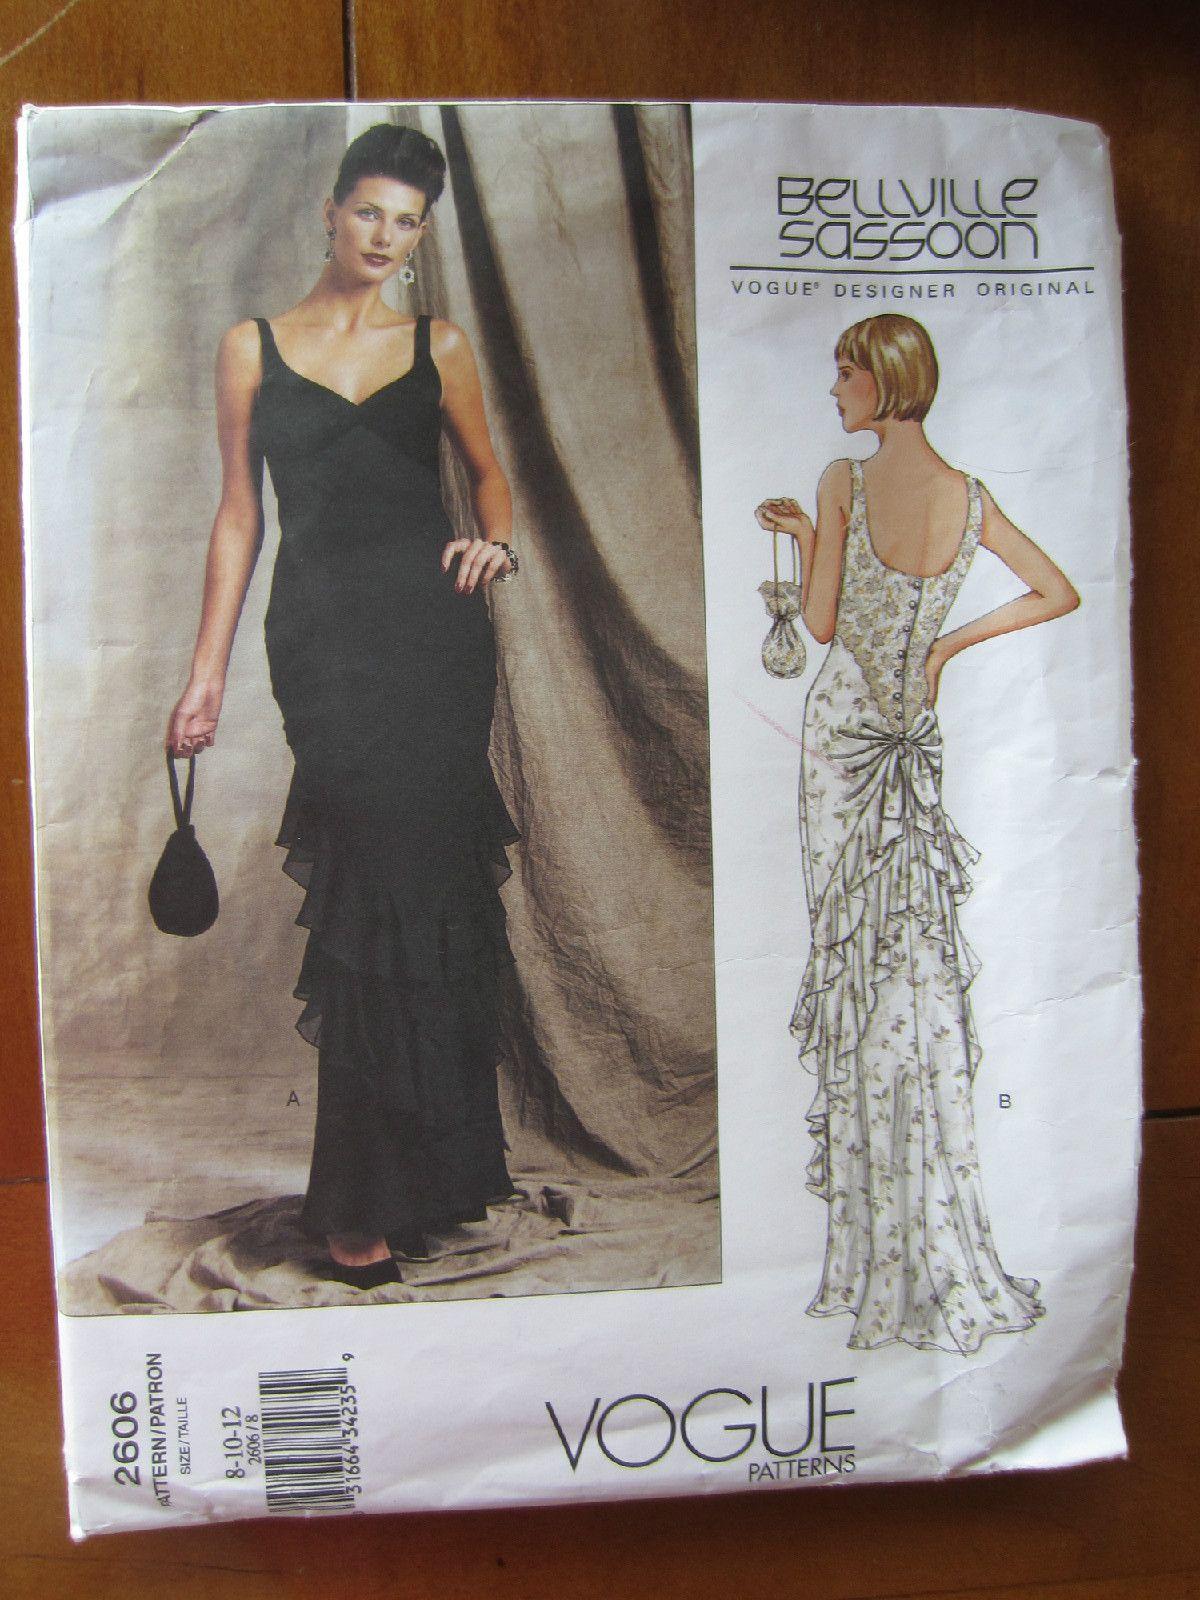 Vogue Pattern 2606 Designer Original Bellville Sassoon Formal Dress